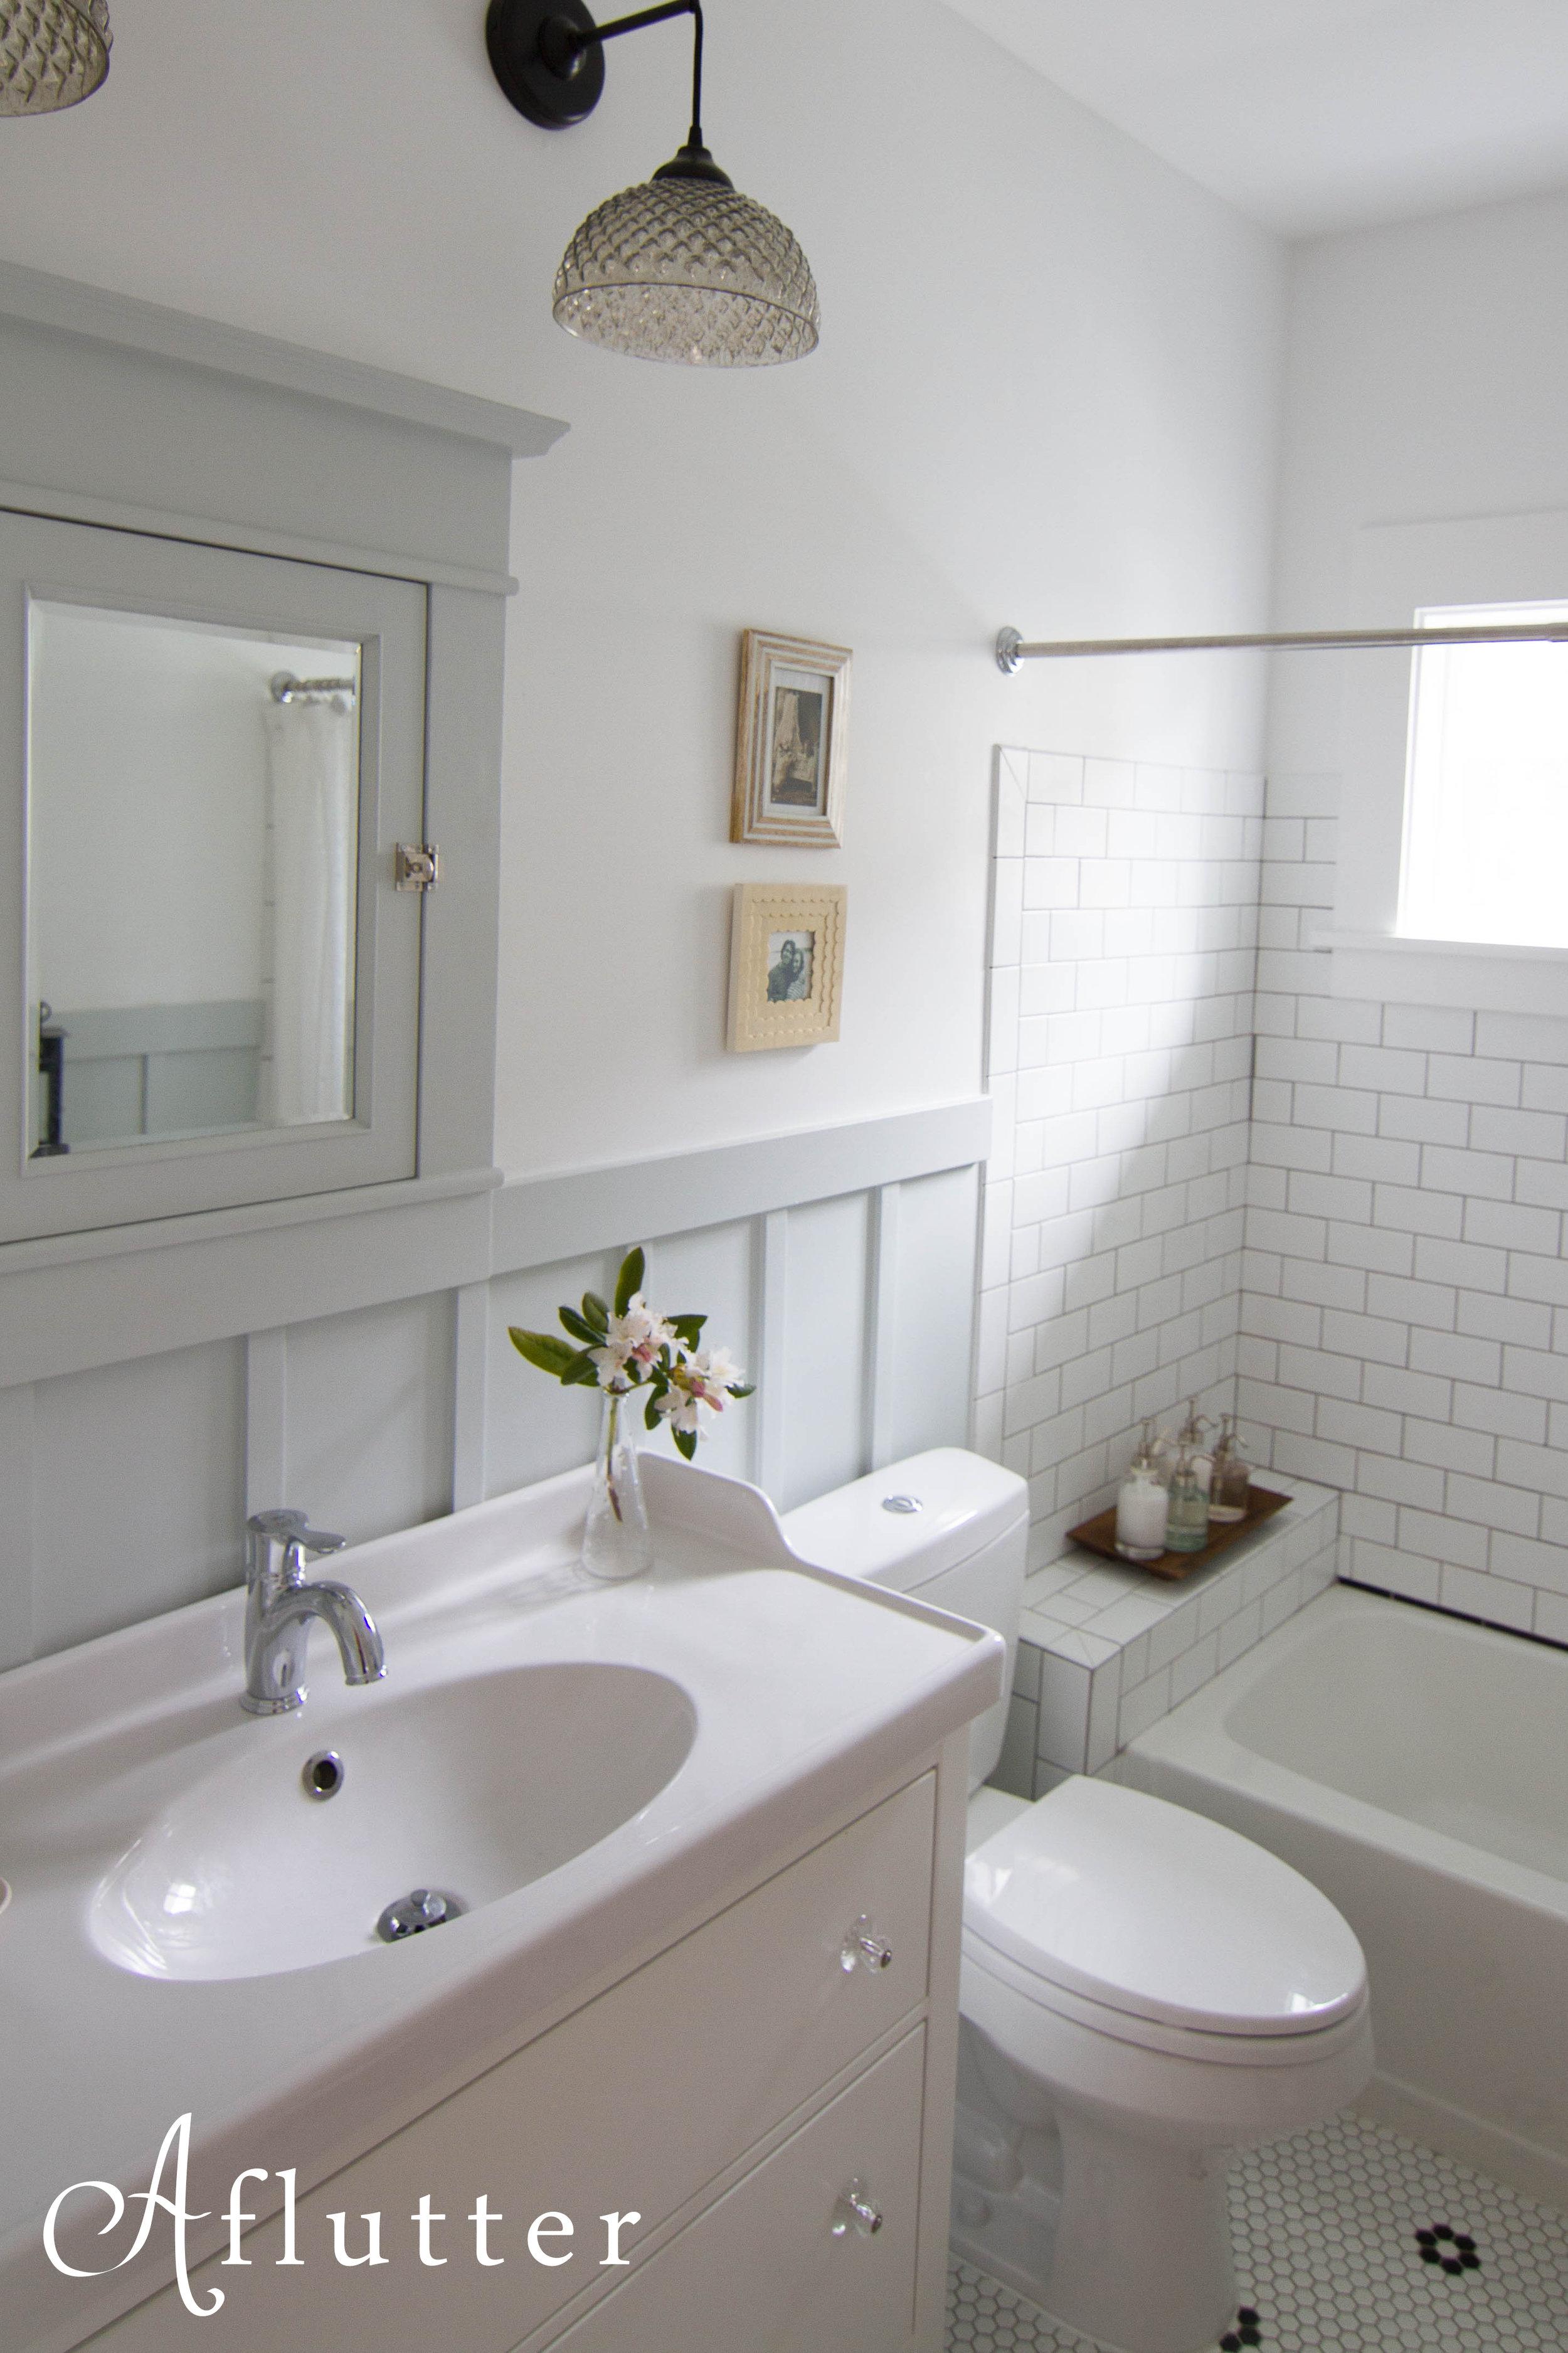 Bath-Remodel-11-of-11.jpg